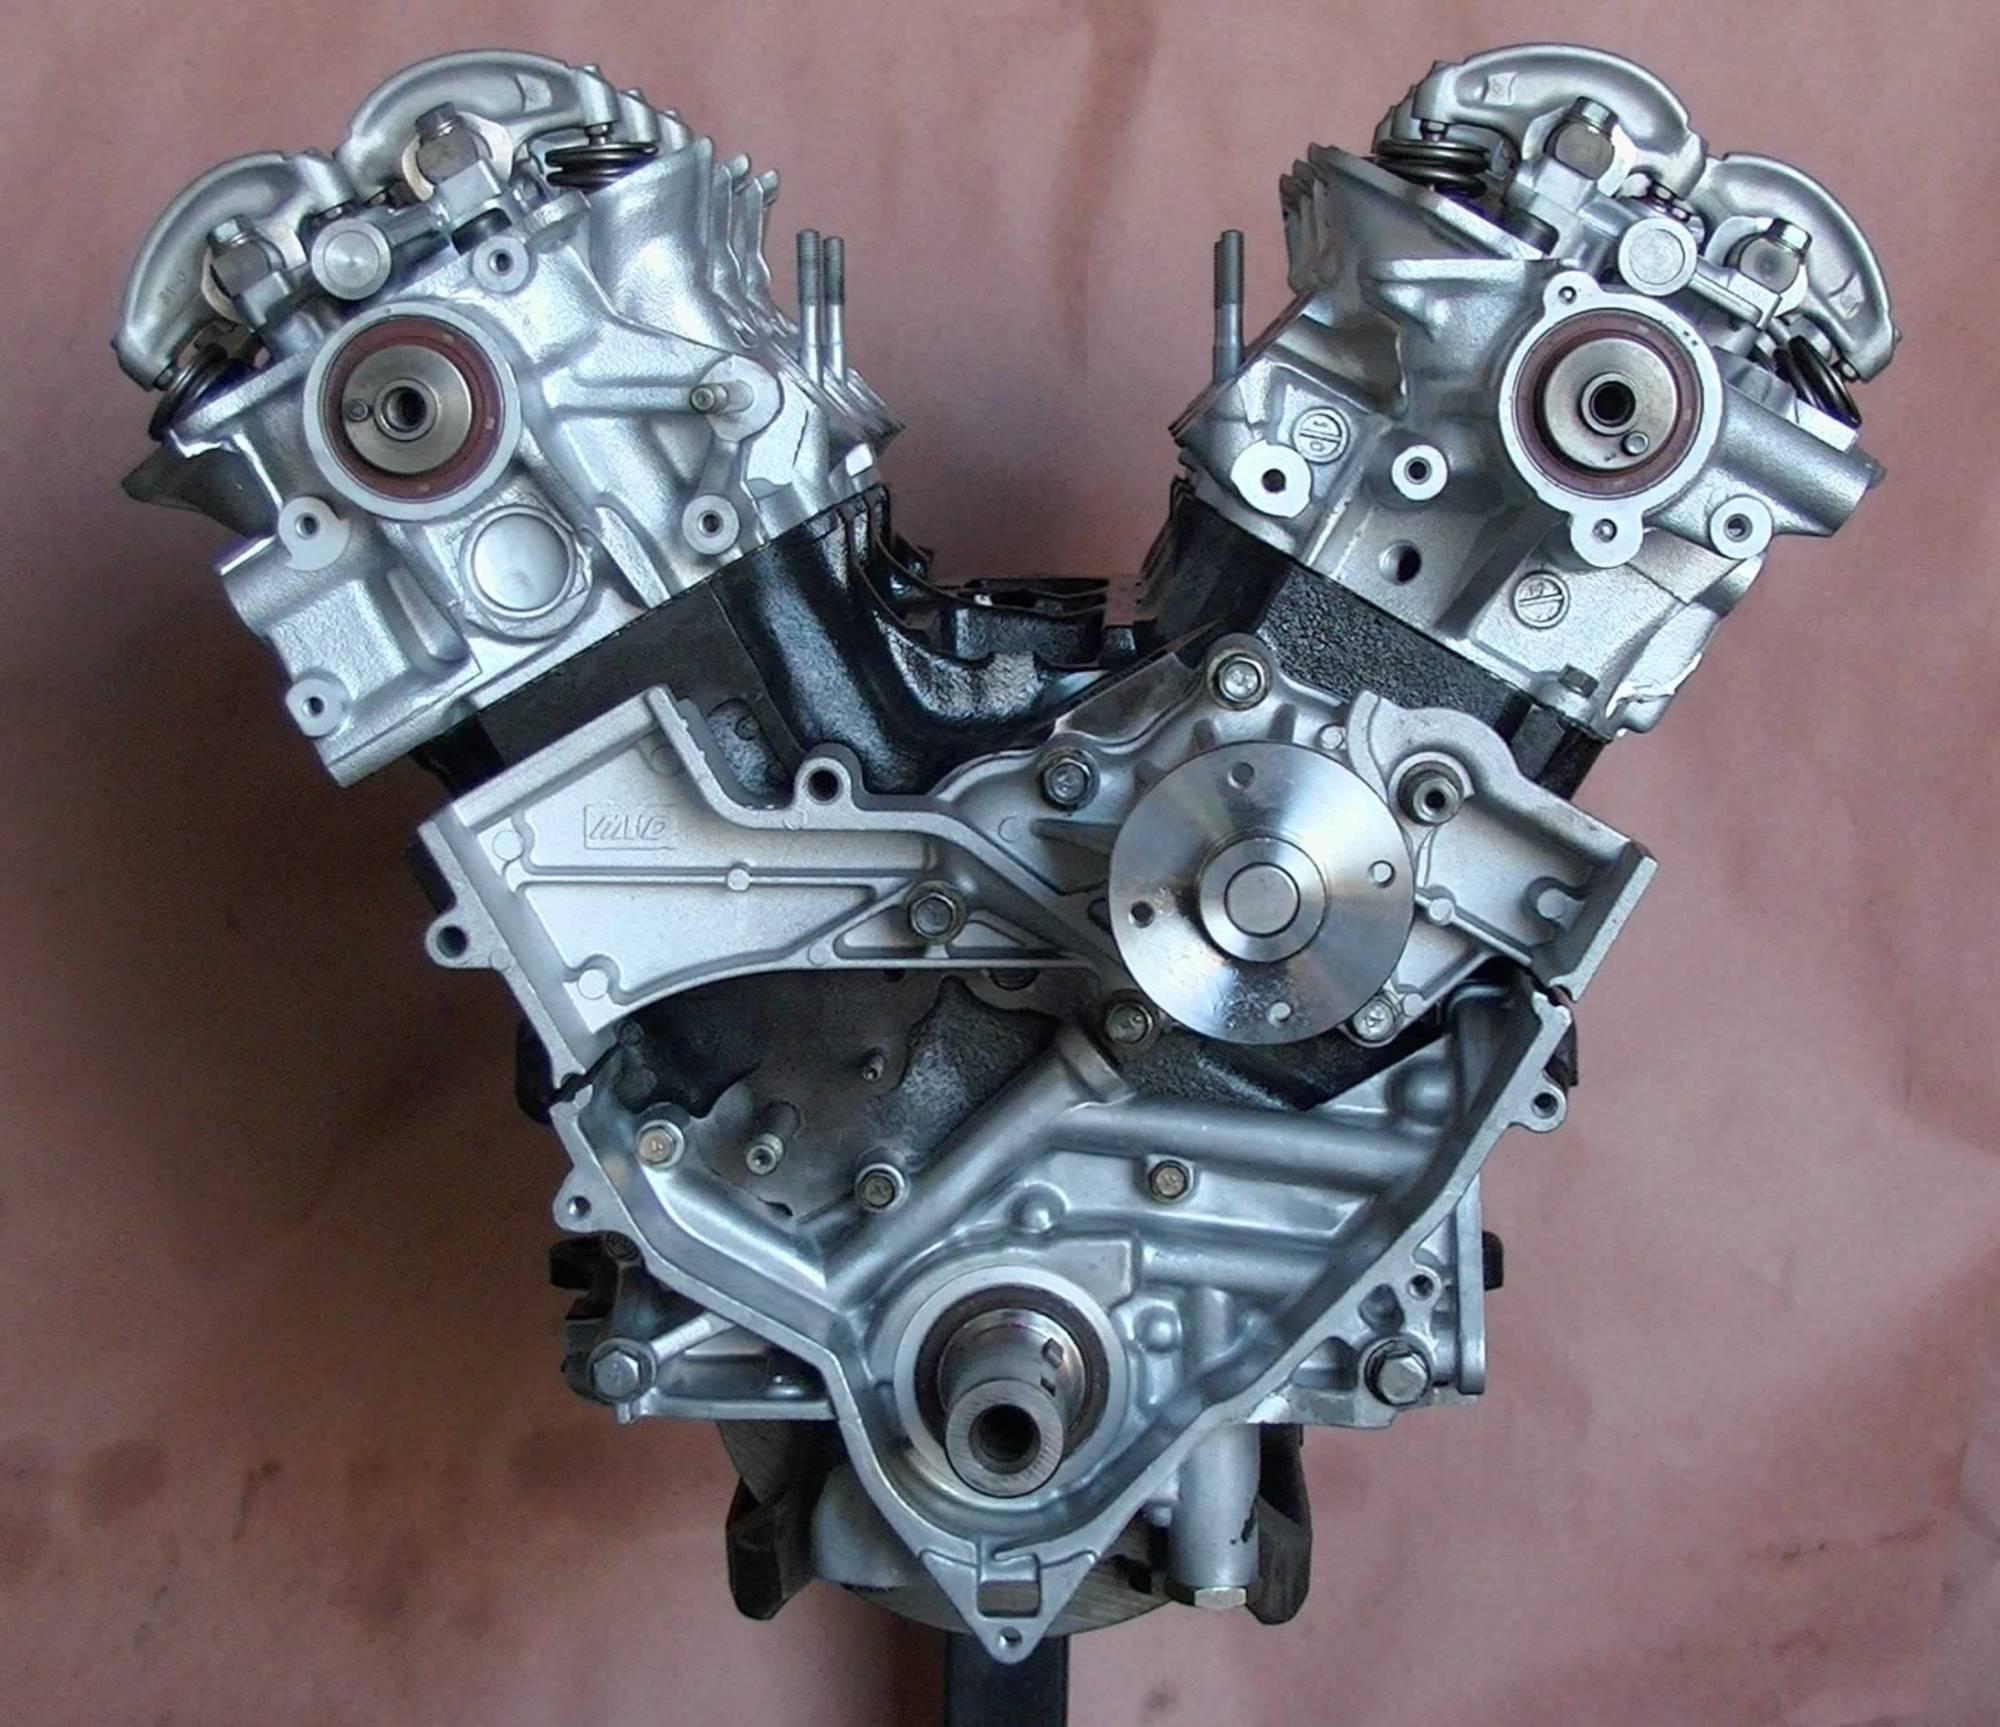 hight resolution of nissan vg33 engine diagram nissan sr20det wiring diagram nissan jdm engines nissan sr20det engine specs